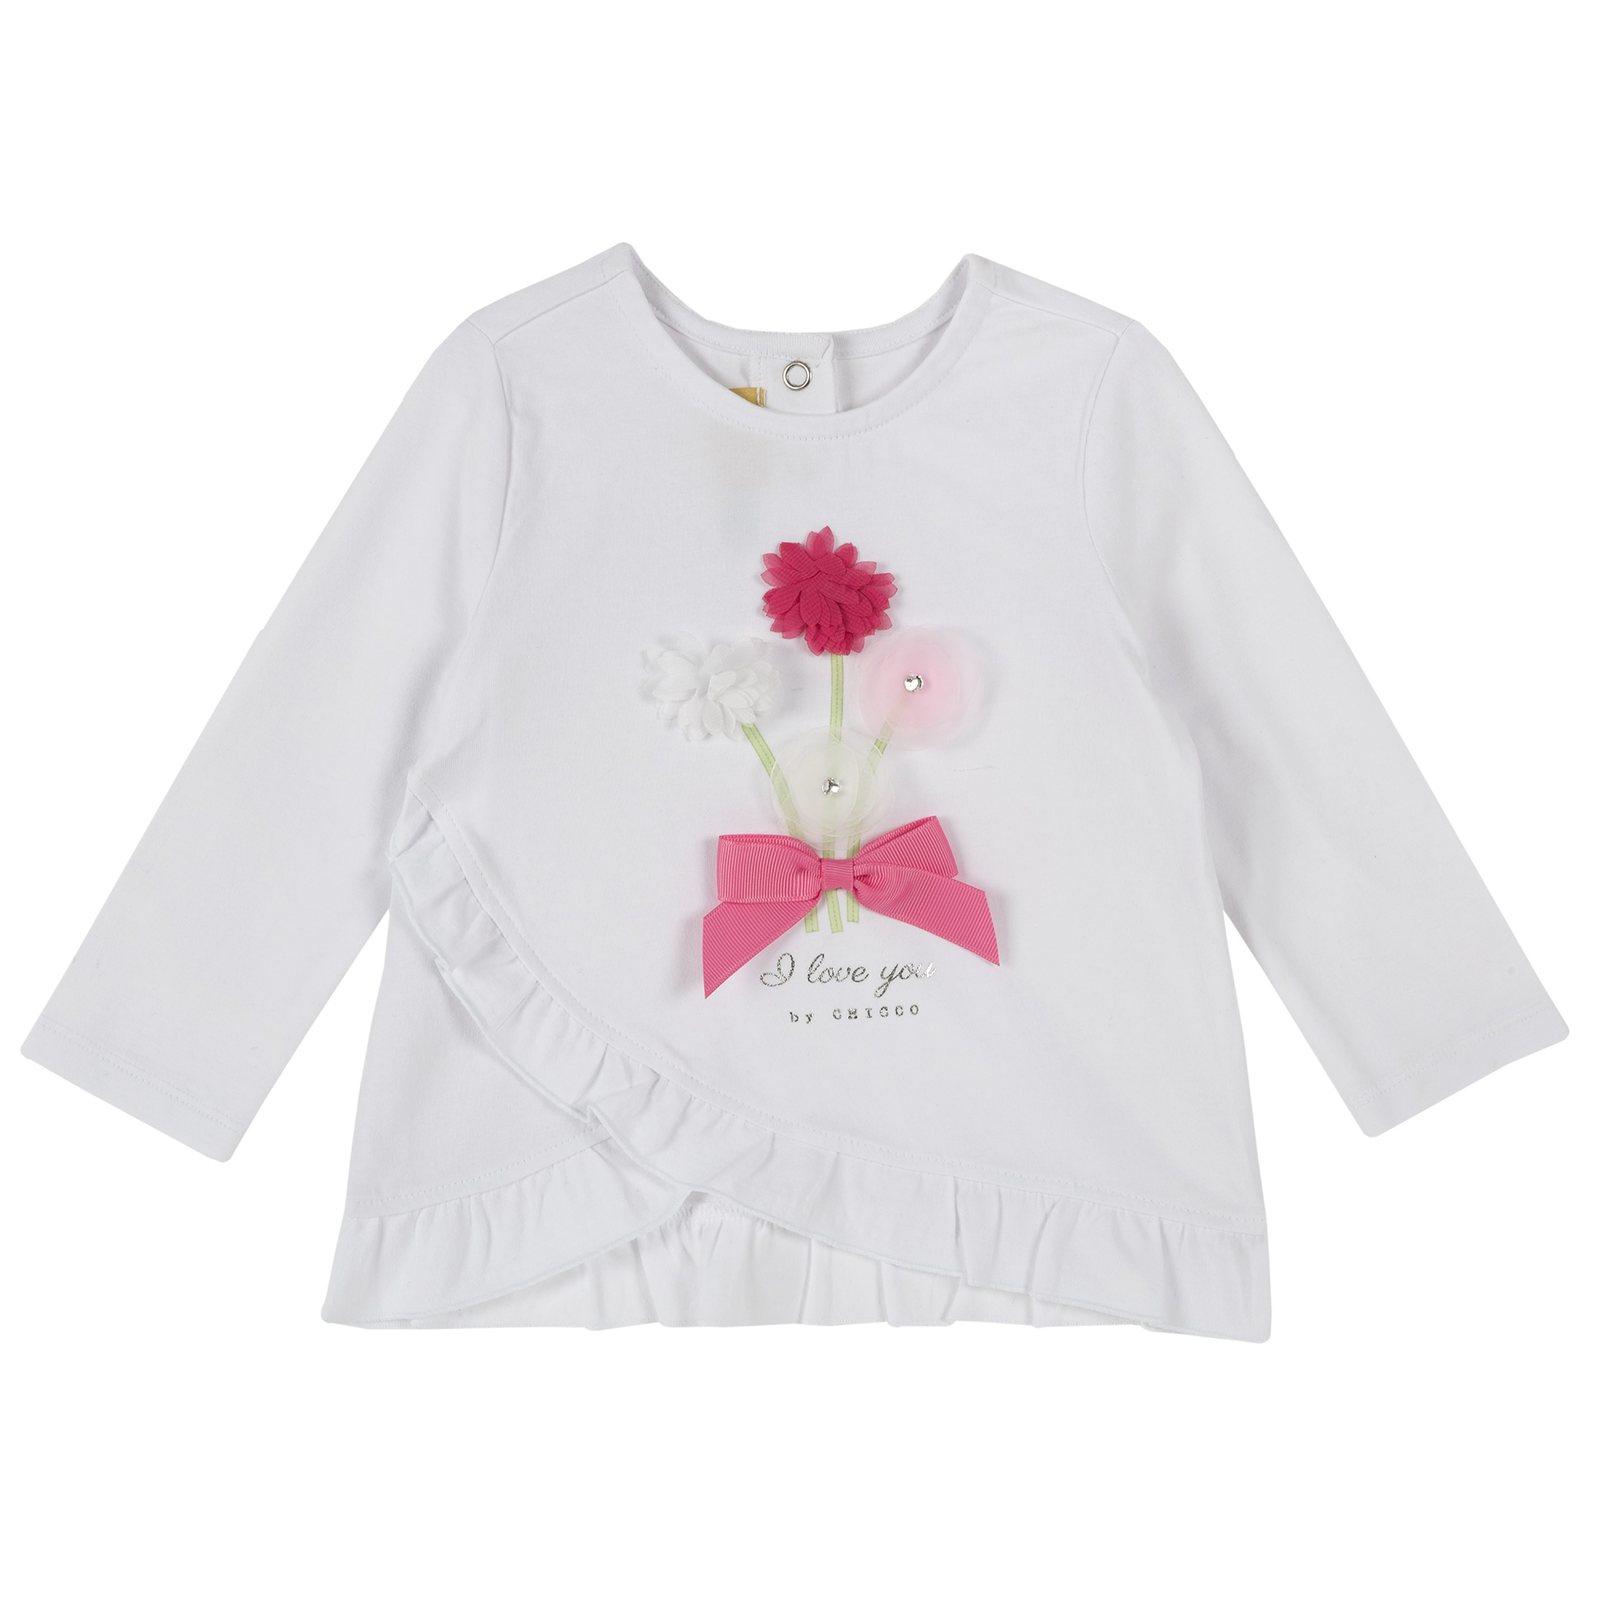 a0cf5caea407b9 Camicie e T-shirt bambina t-shirt con fiori applicati bianco ...